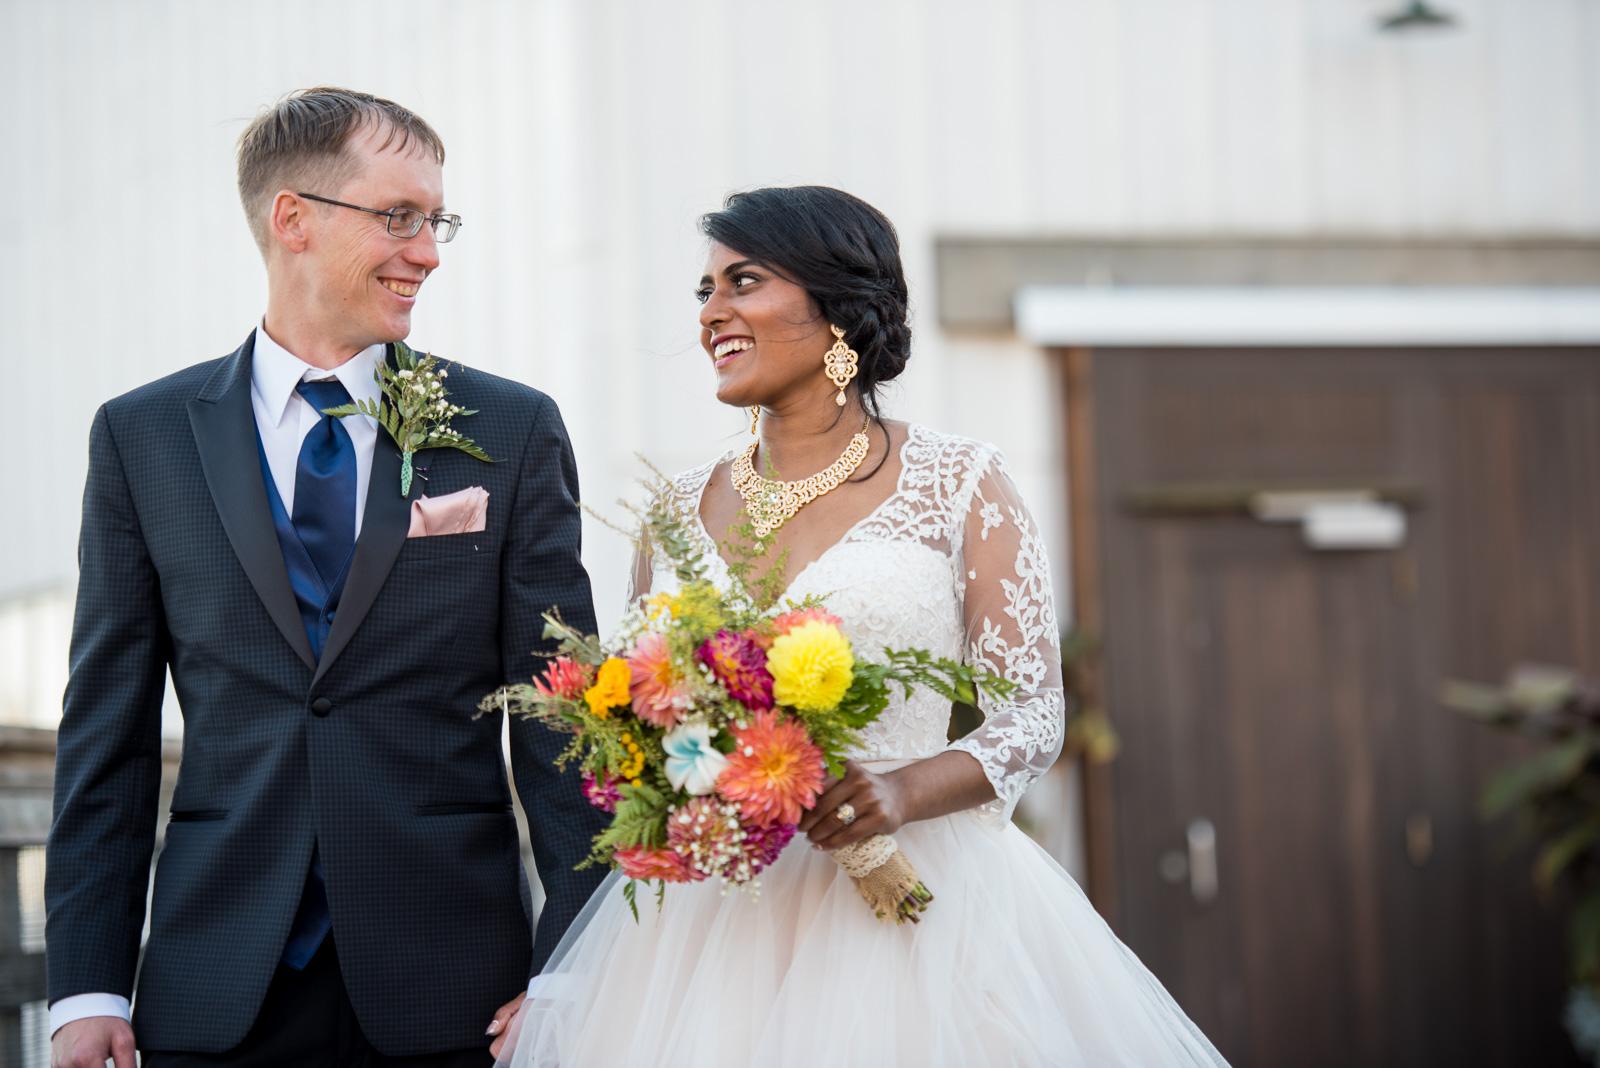 bc-wedding-photographers-paradise-banquet-hall-wedding-21.jpg